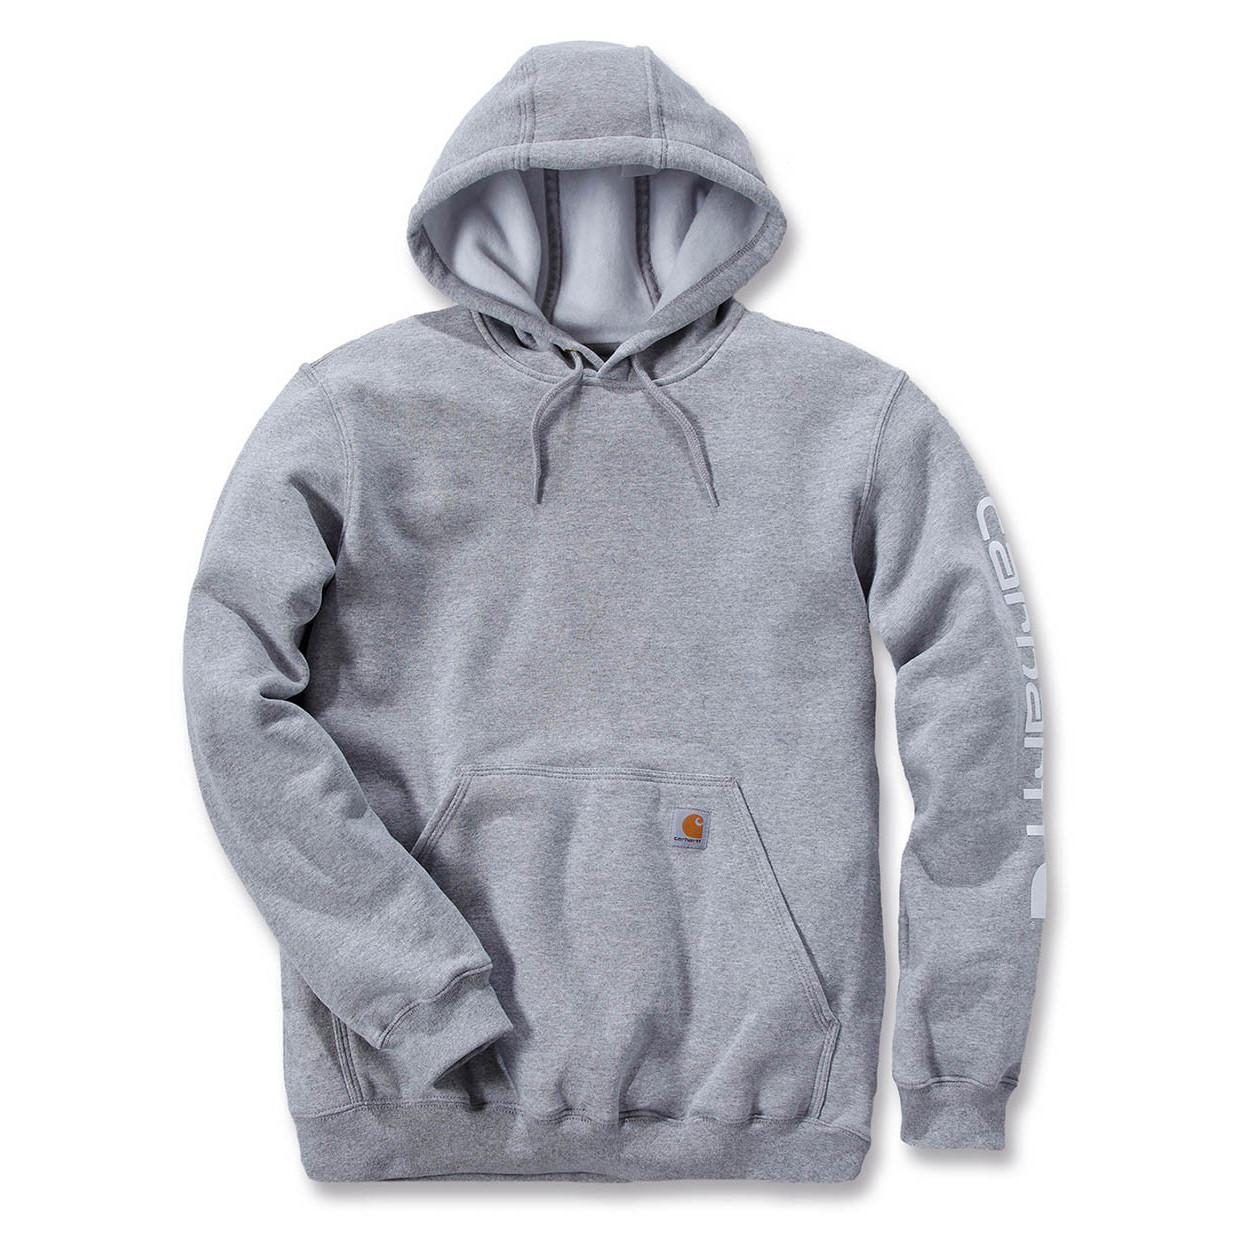 Худи Carhartt Sleeve Logo Hooded Sweatshirt (K288)